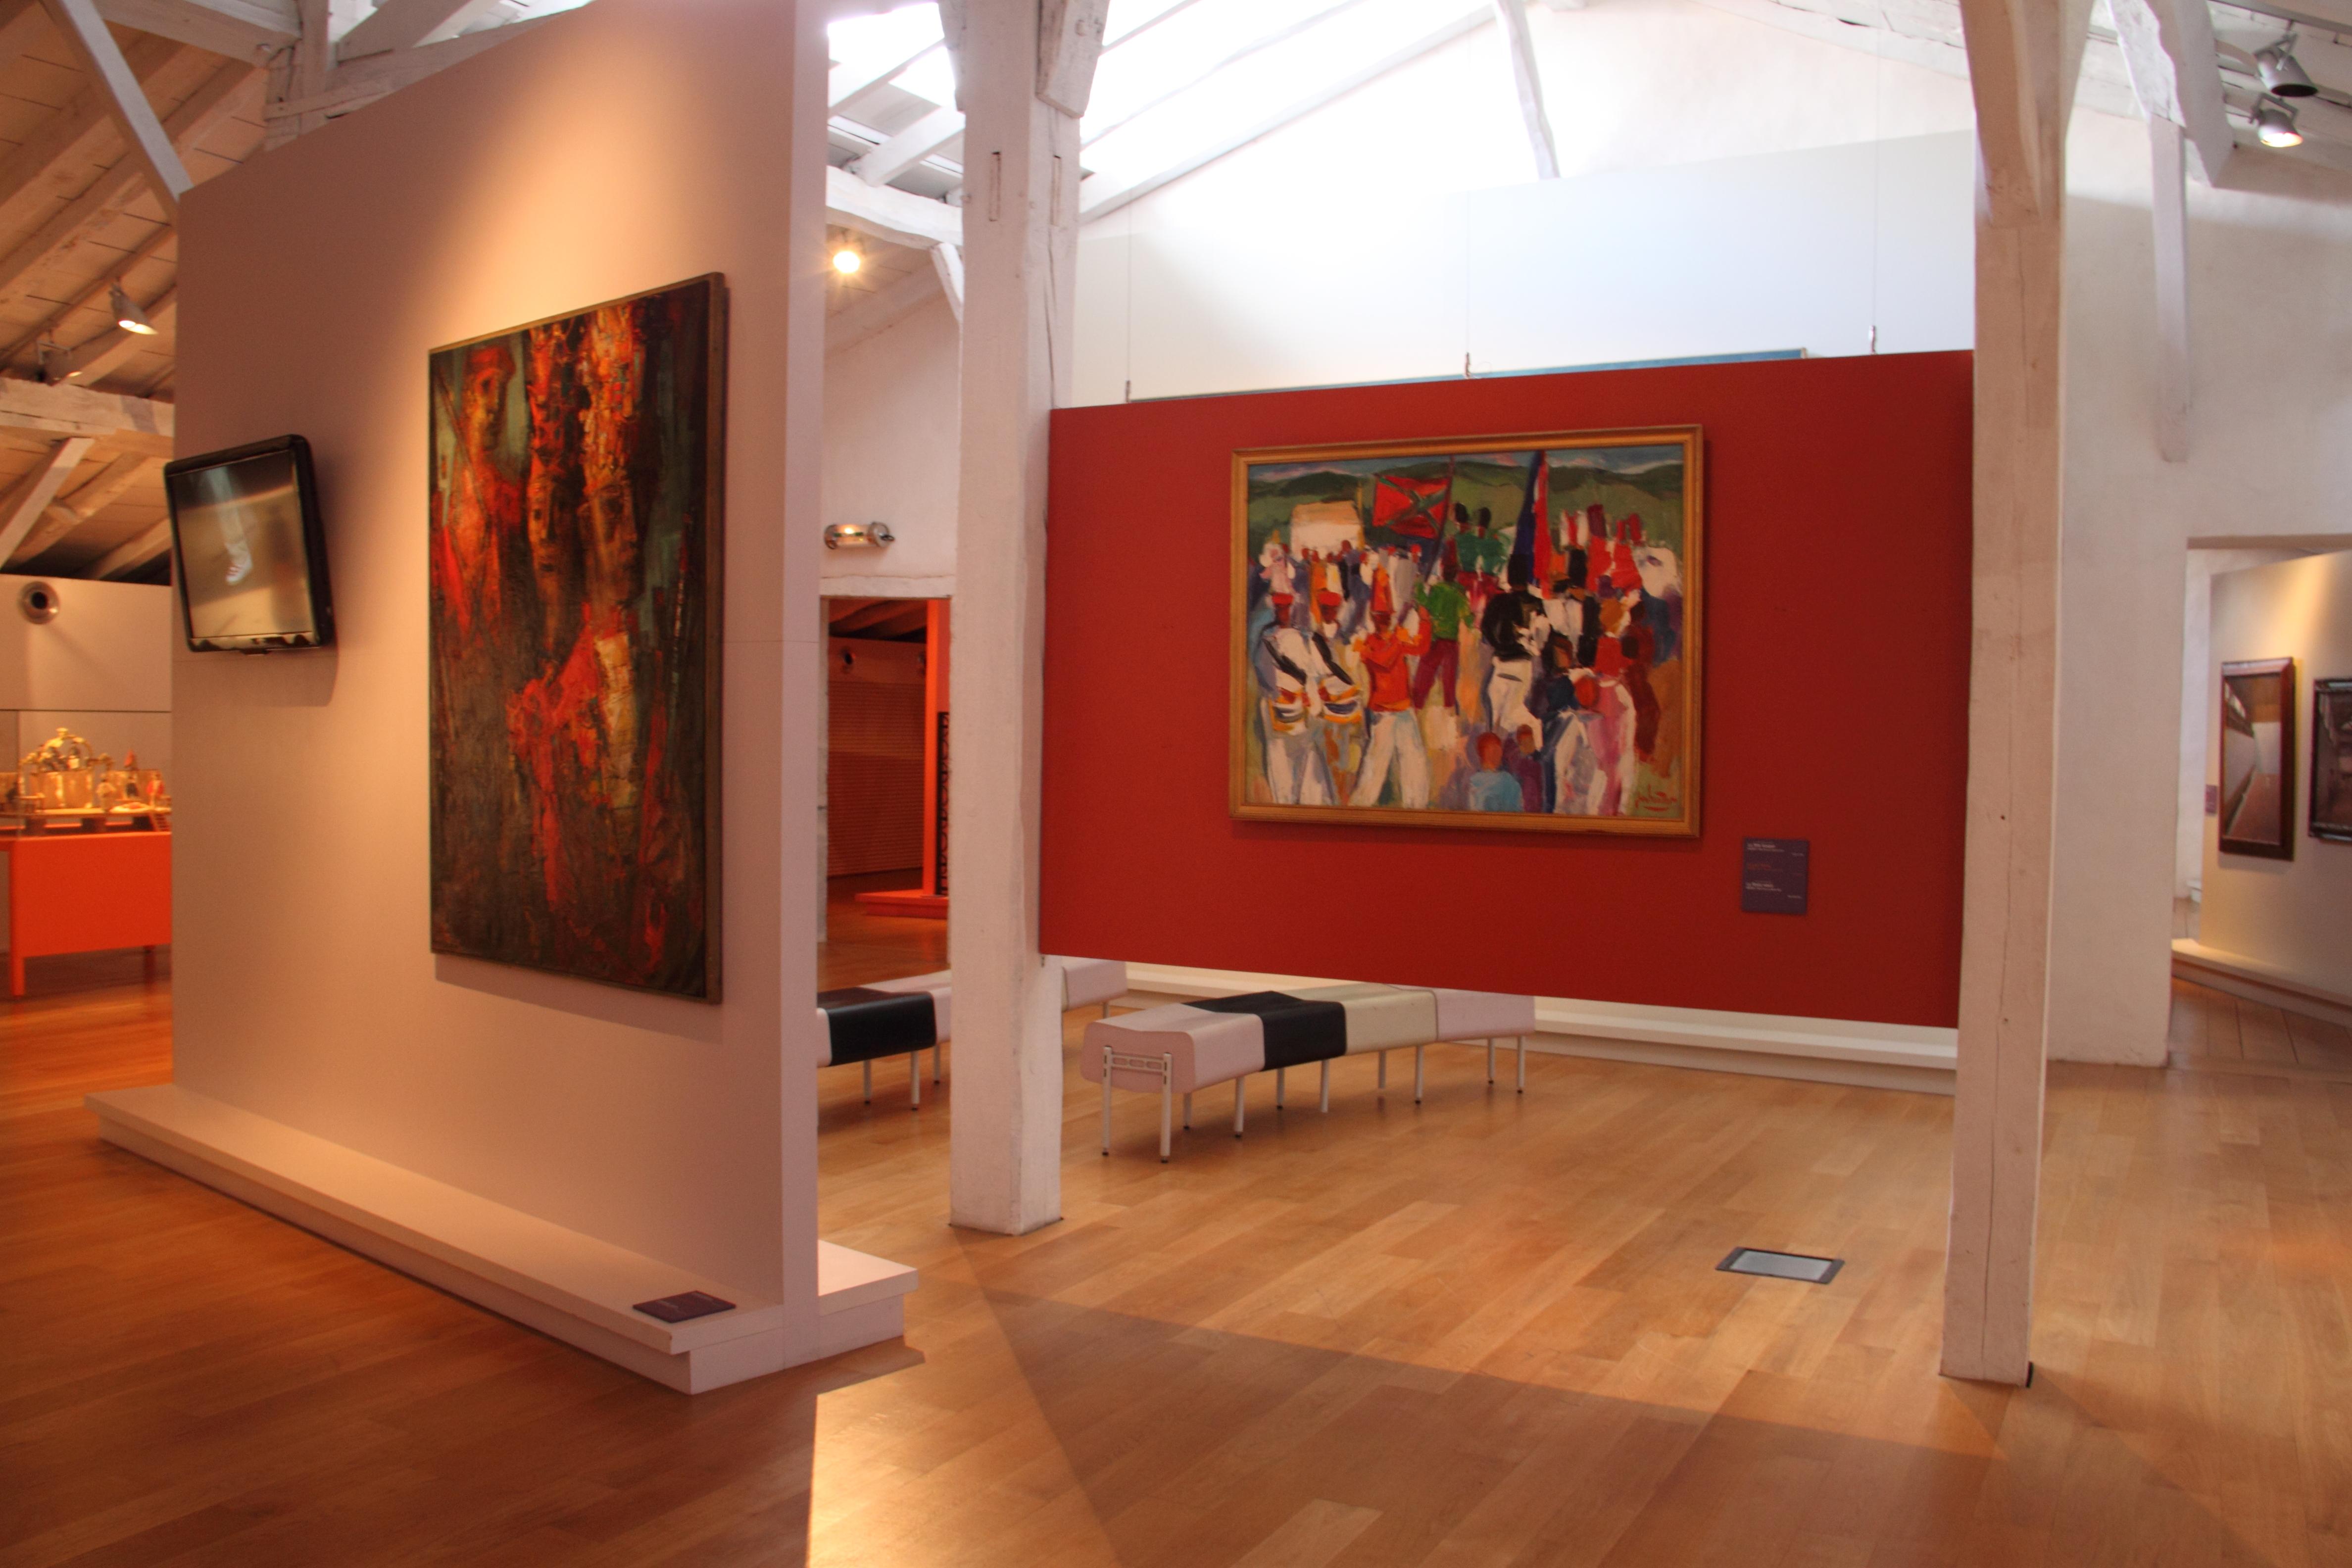 Art history 2011 - 1 part 1